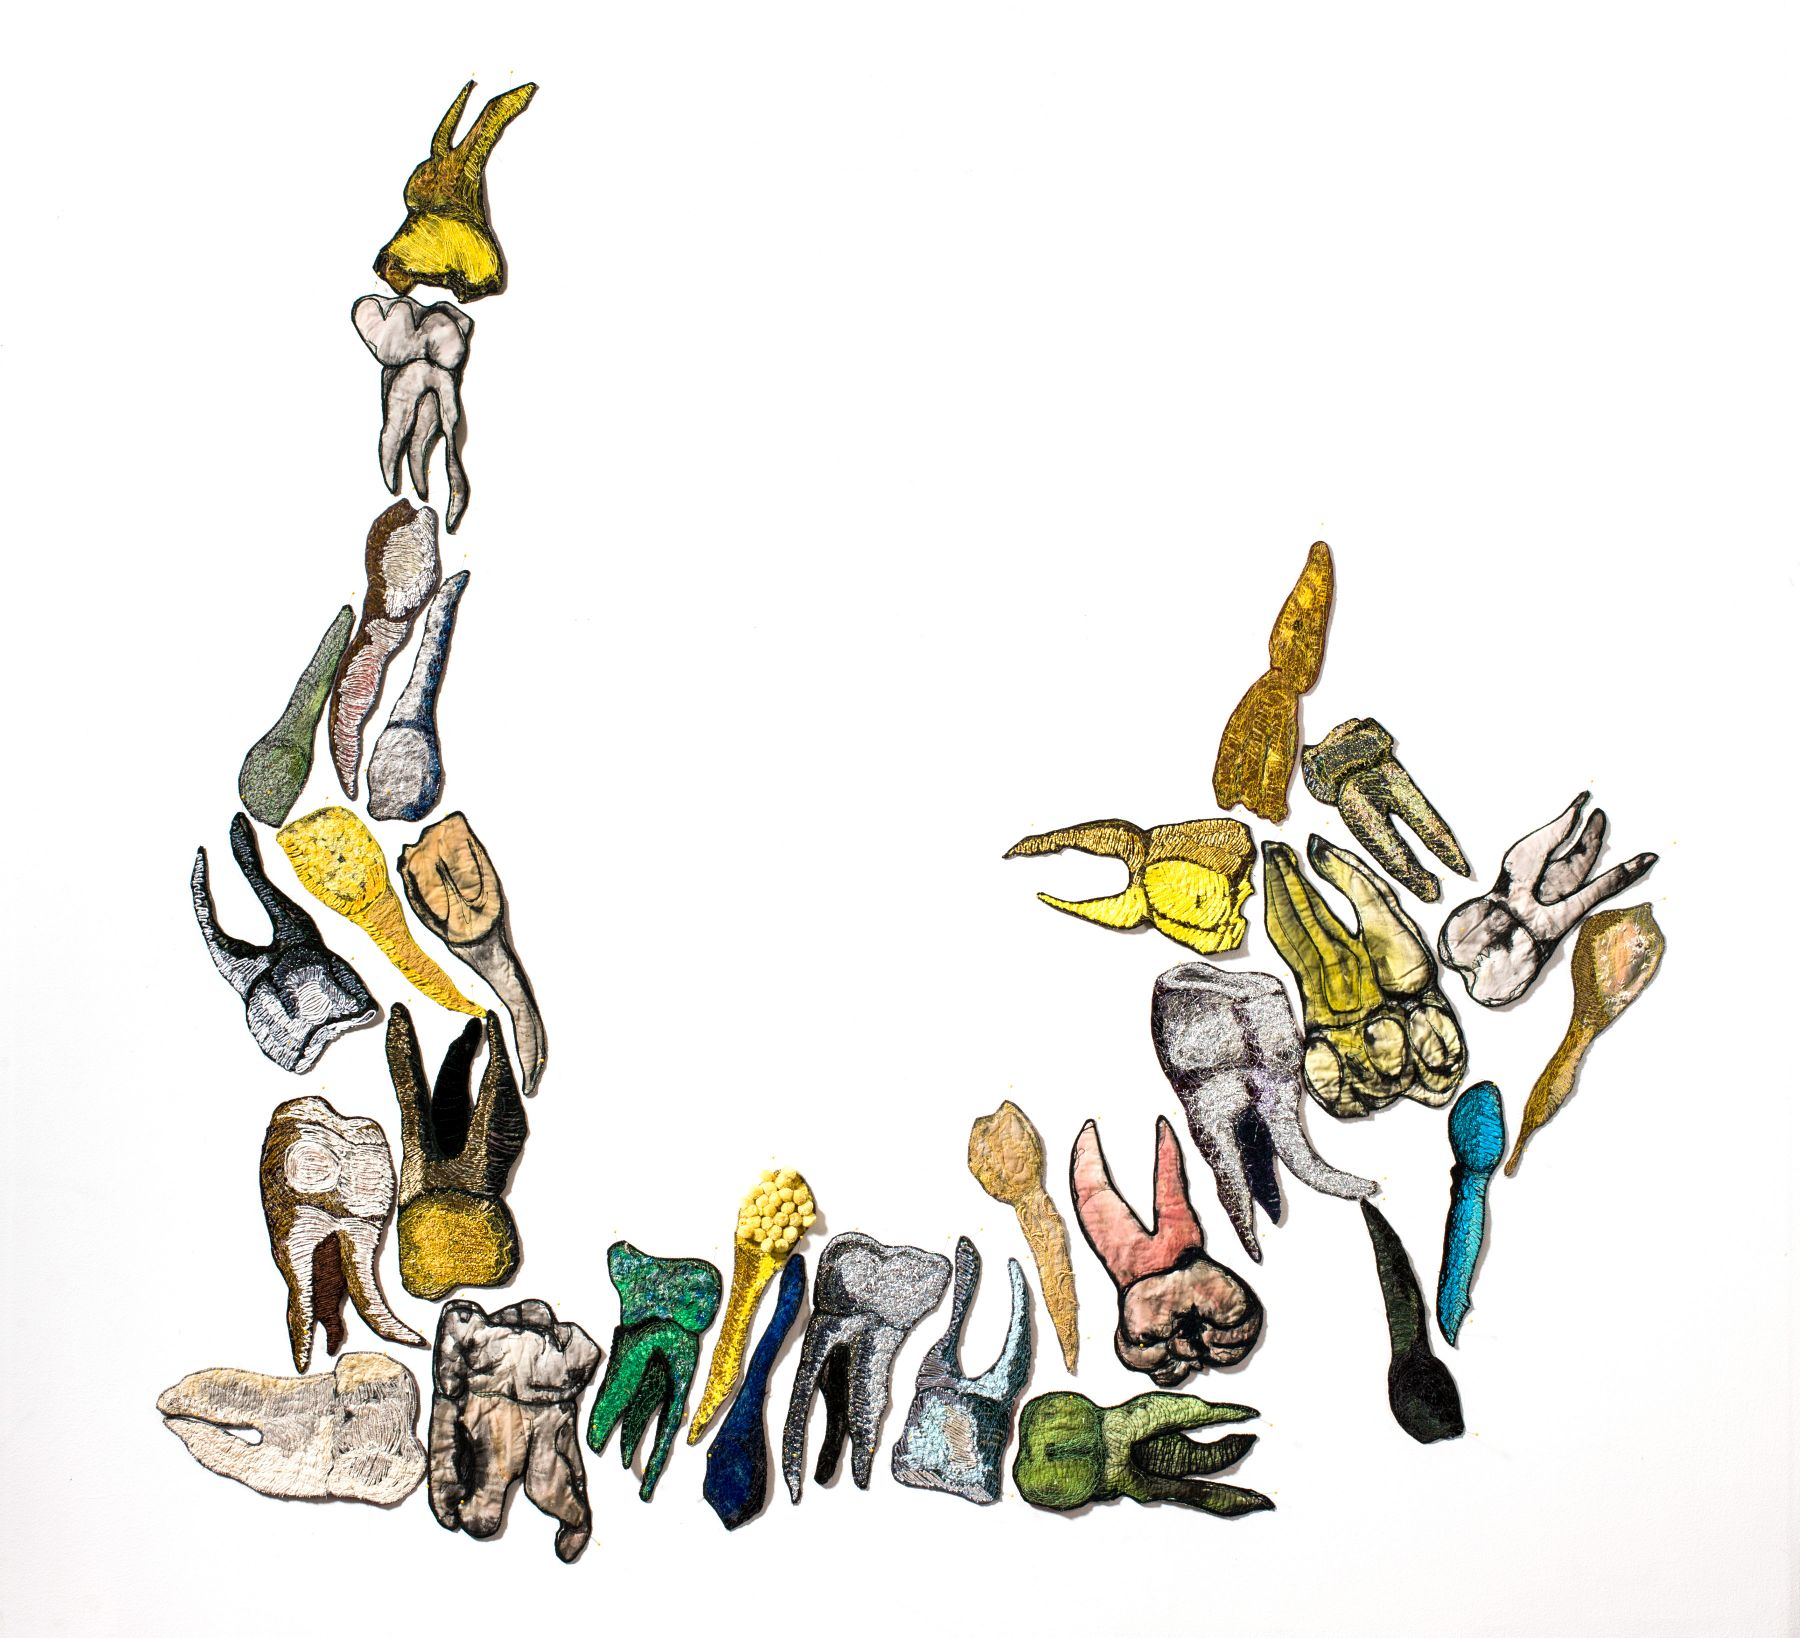 GINA PHILLIPS Reminiscent Teeth, 2012